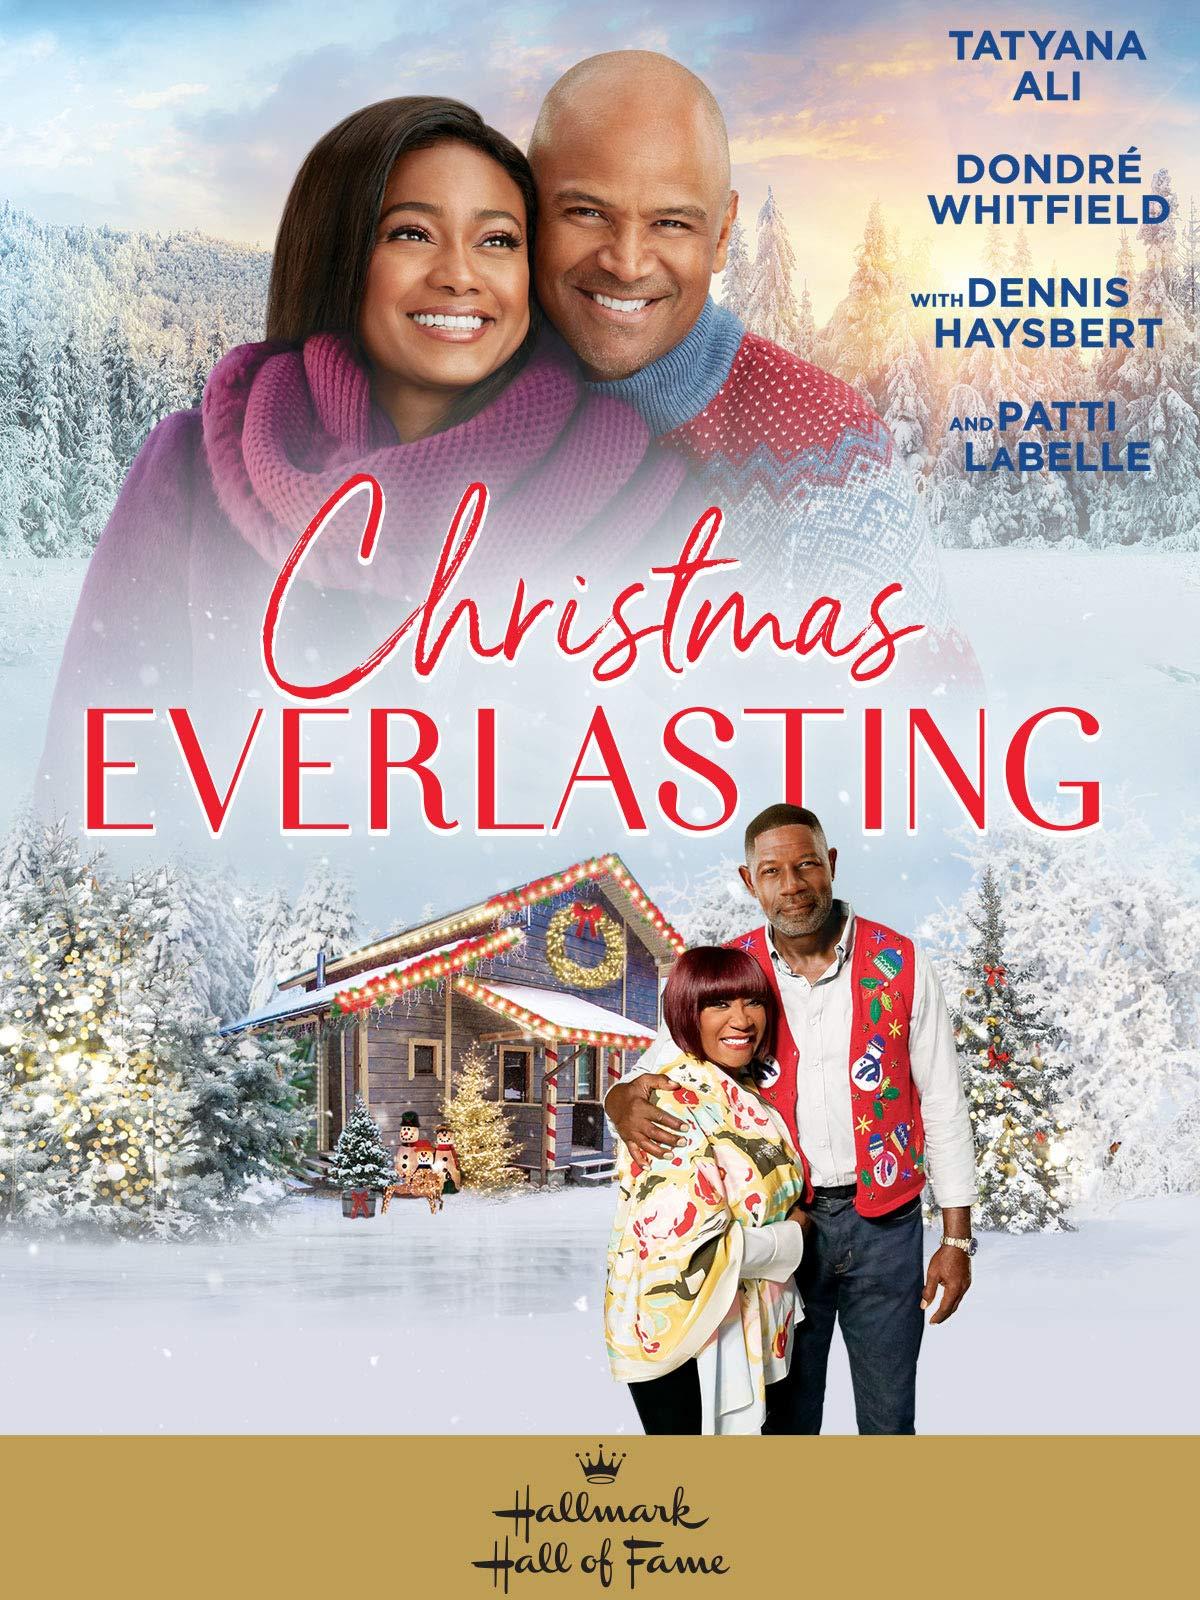 Watch Christmas Everlasting Tatyana Ali 2020 Online For Free Watch Christmas Everlasting | Prime Video